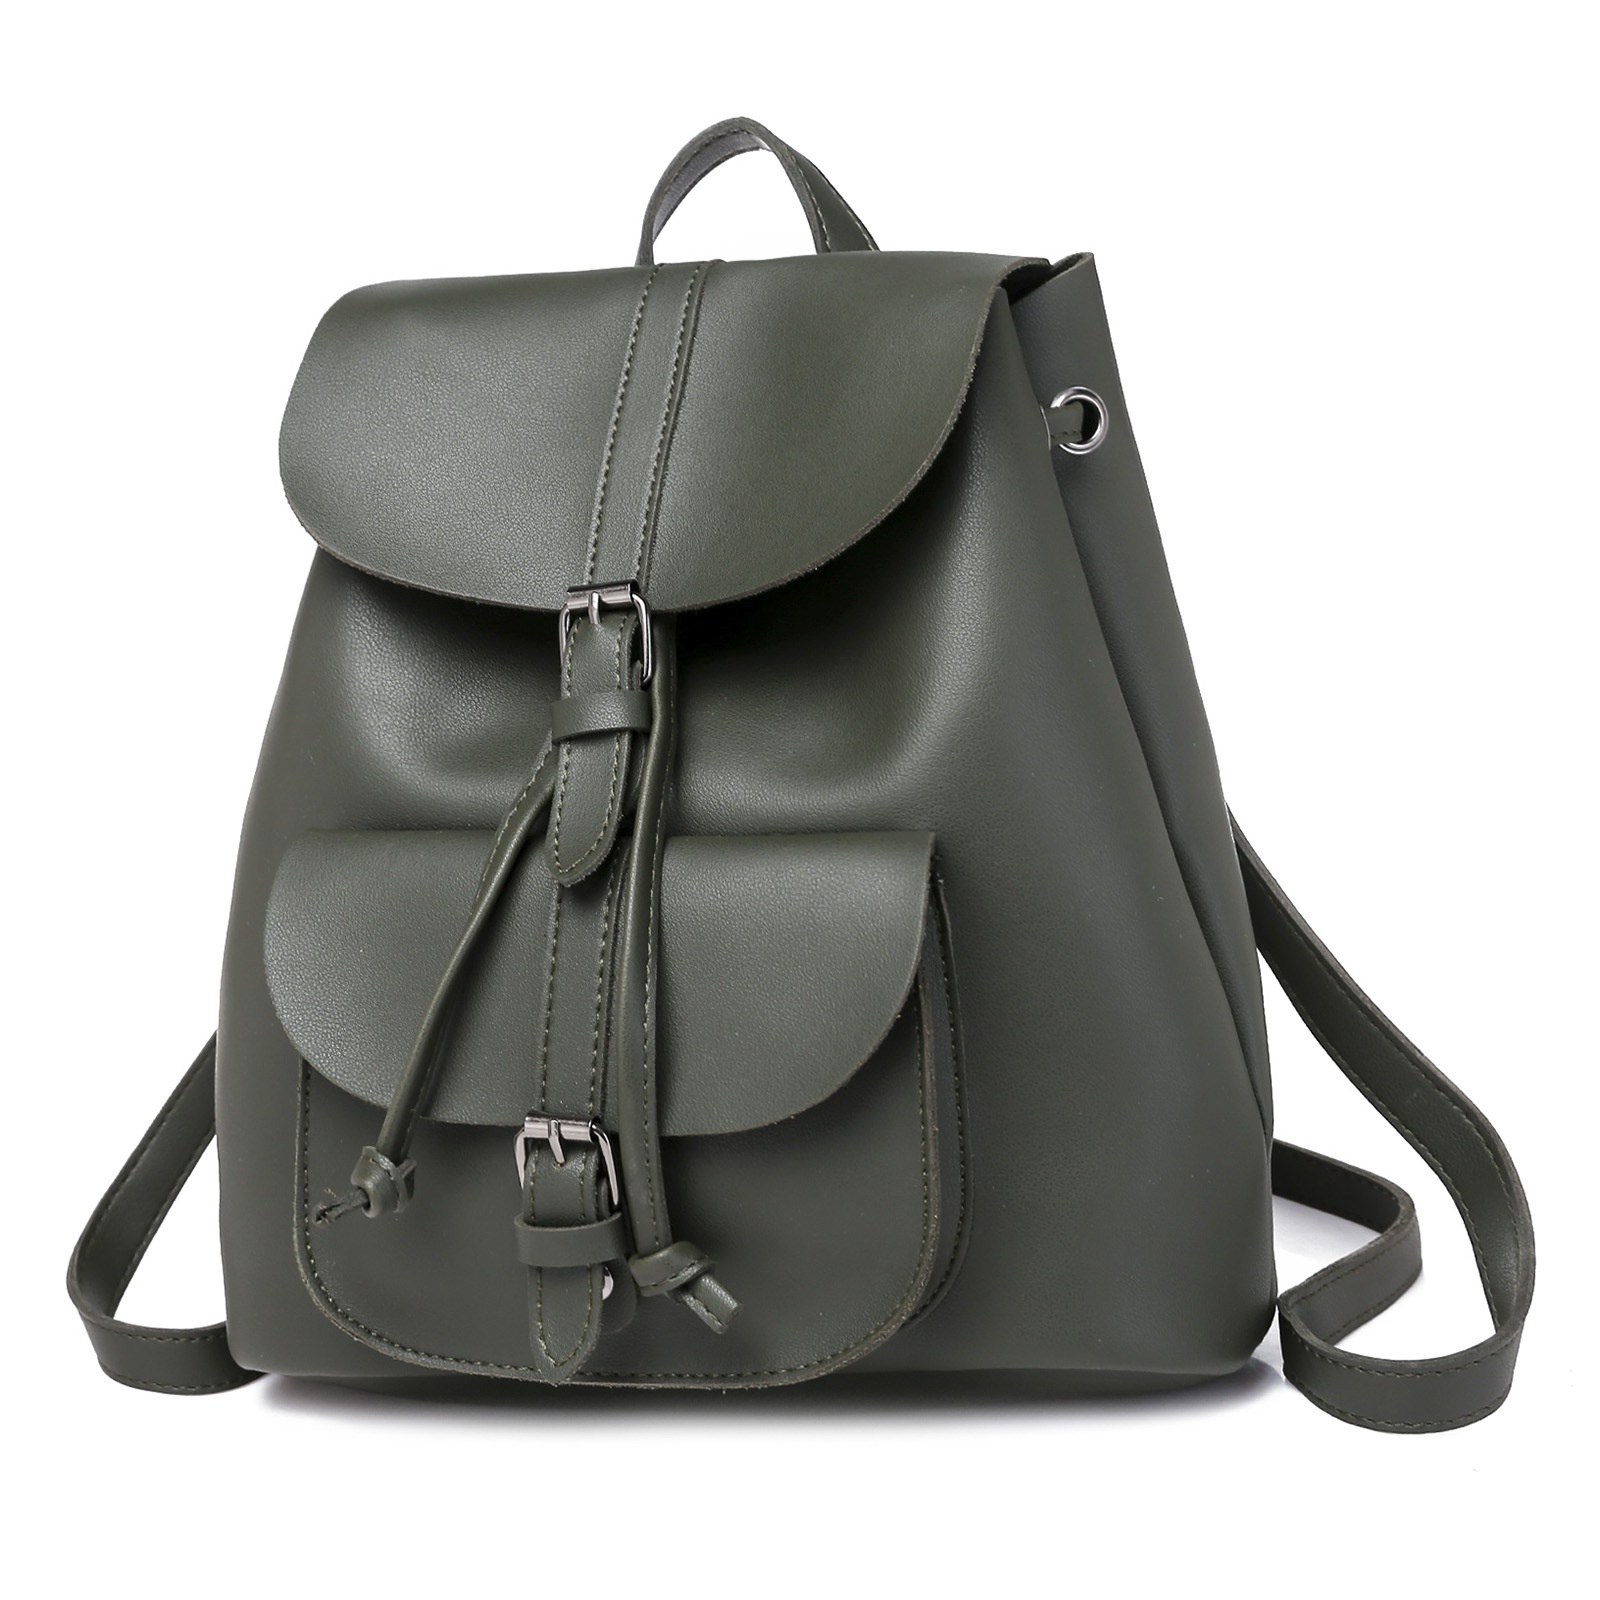 HTB1rHIybdfvK1RjSspfq6zzXFXaQ Pocket PU Leather Women Backpack Female Retro Designer Schoolbag for Teenagers Girl's Casual Large Travel Bag Laptop Backpack